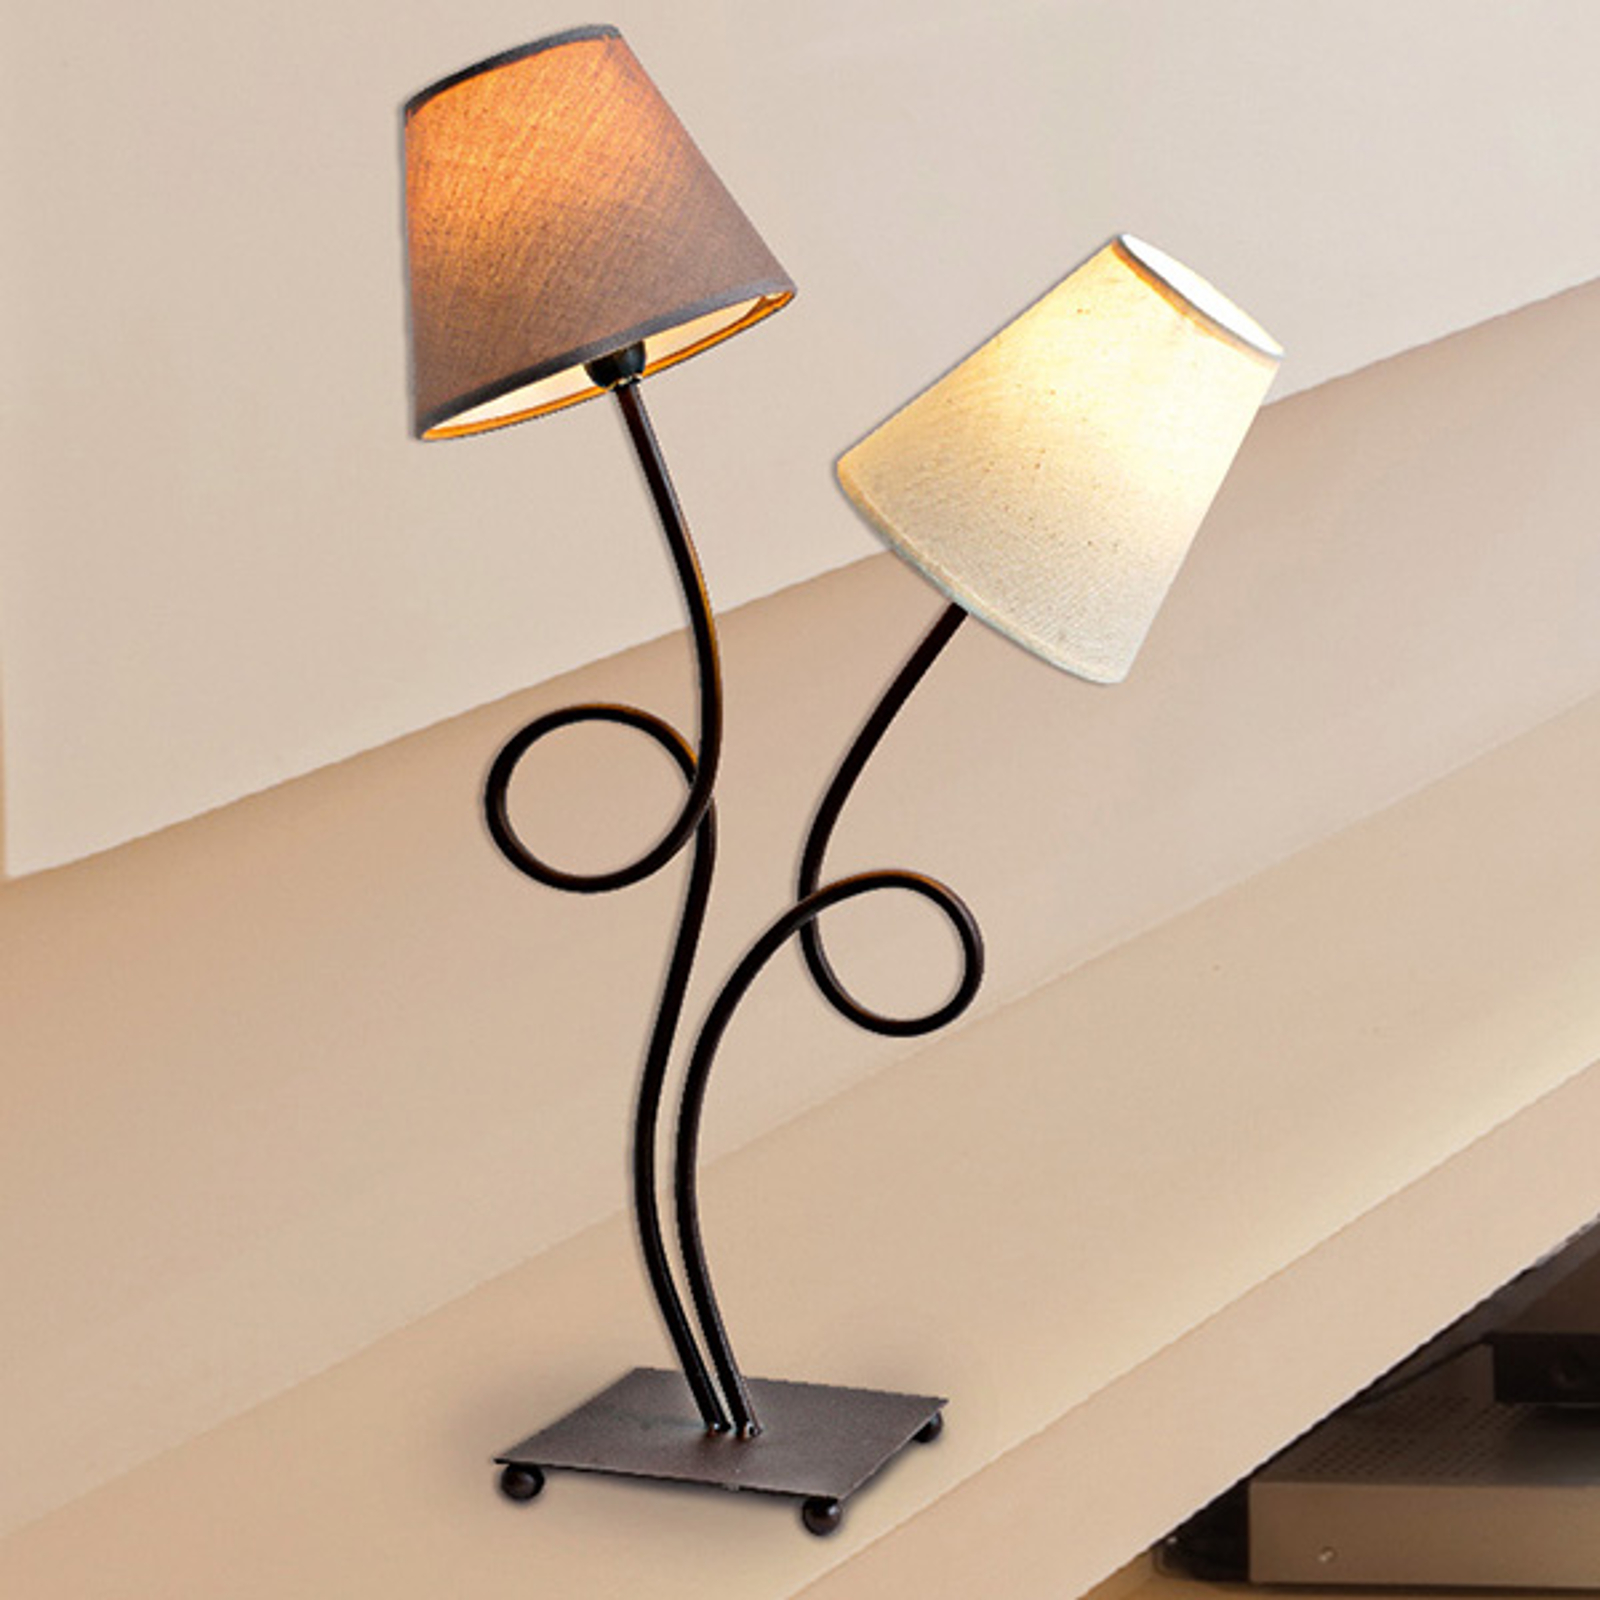 Lampe à poser tissu Twiddle à deux lampes